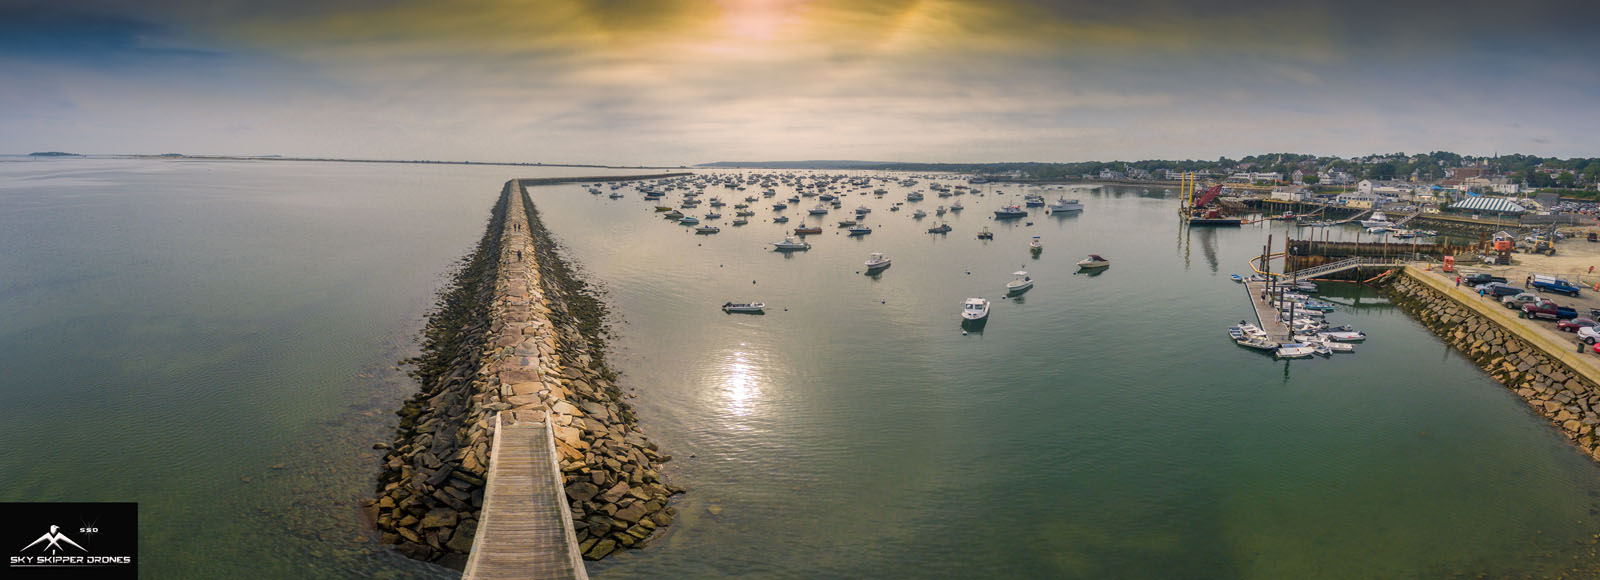 Harbor_